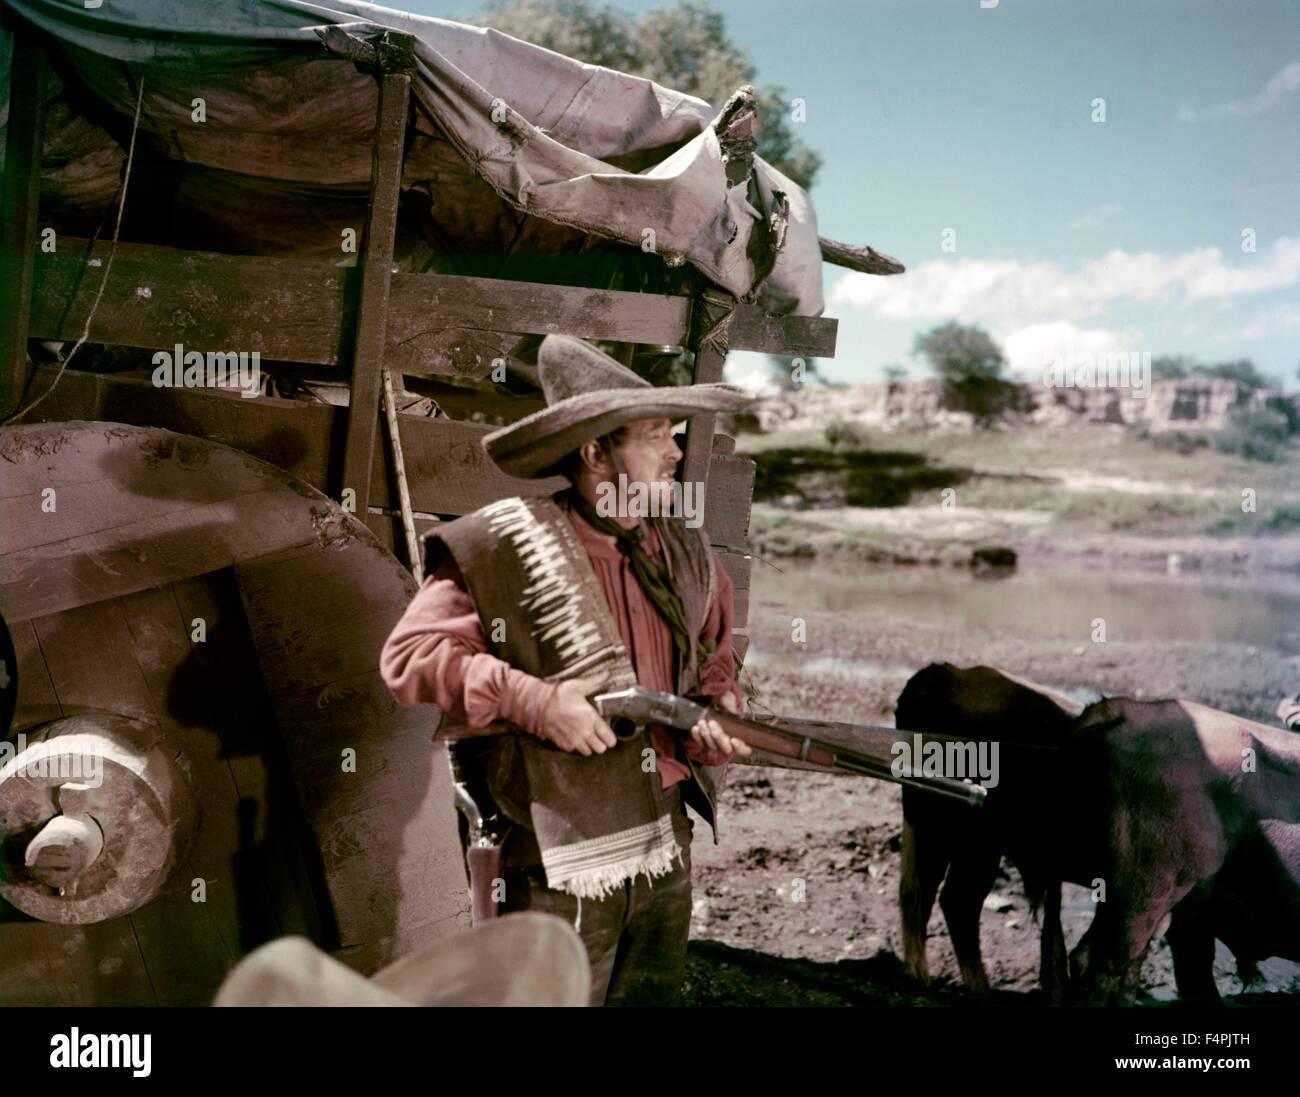 Robert Mitchum / il meraviglioso paese / 1959 diretto da Robert Parrish [United Artists] Immagini Stock